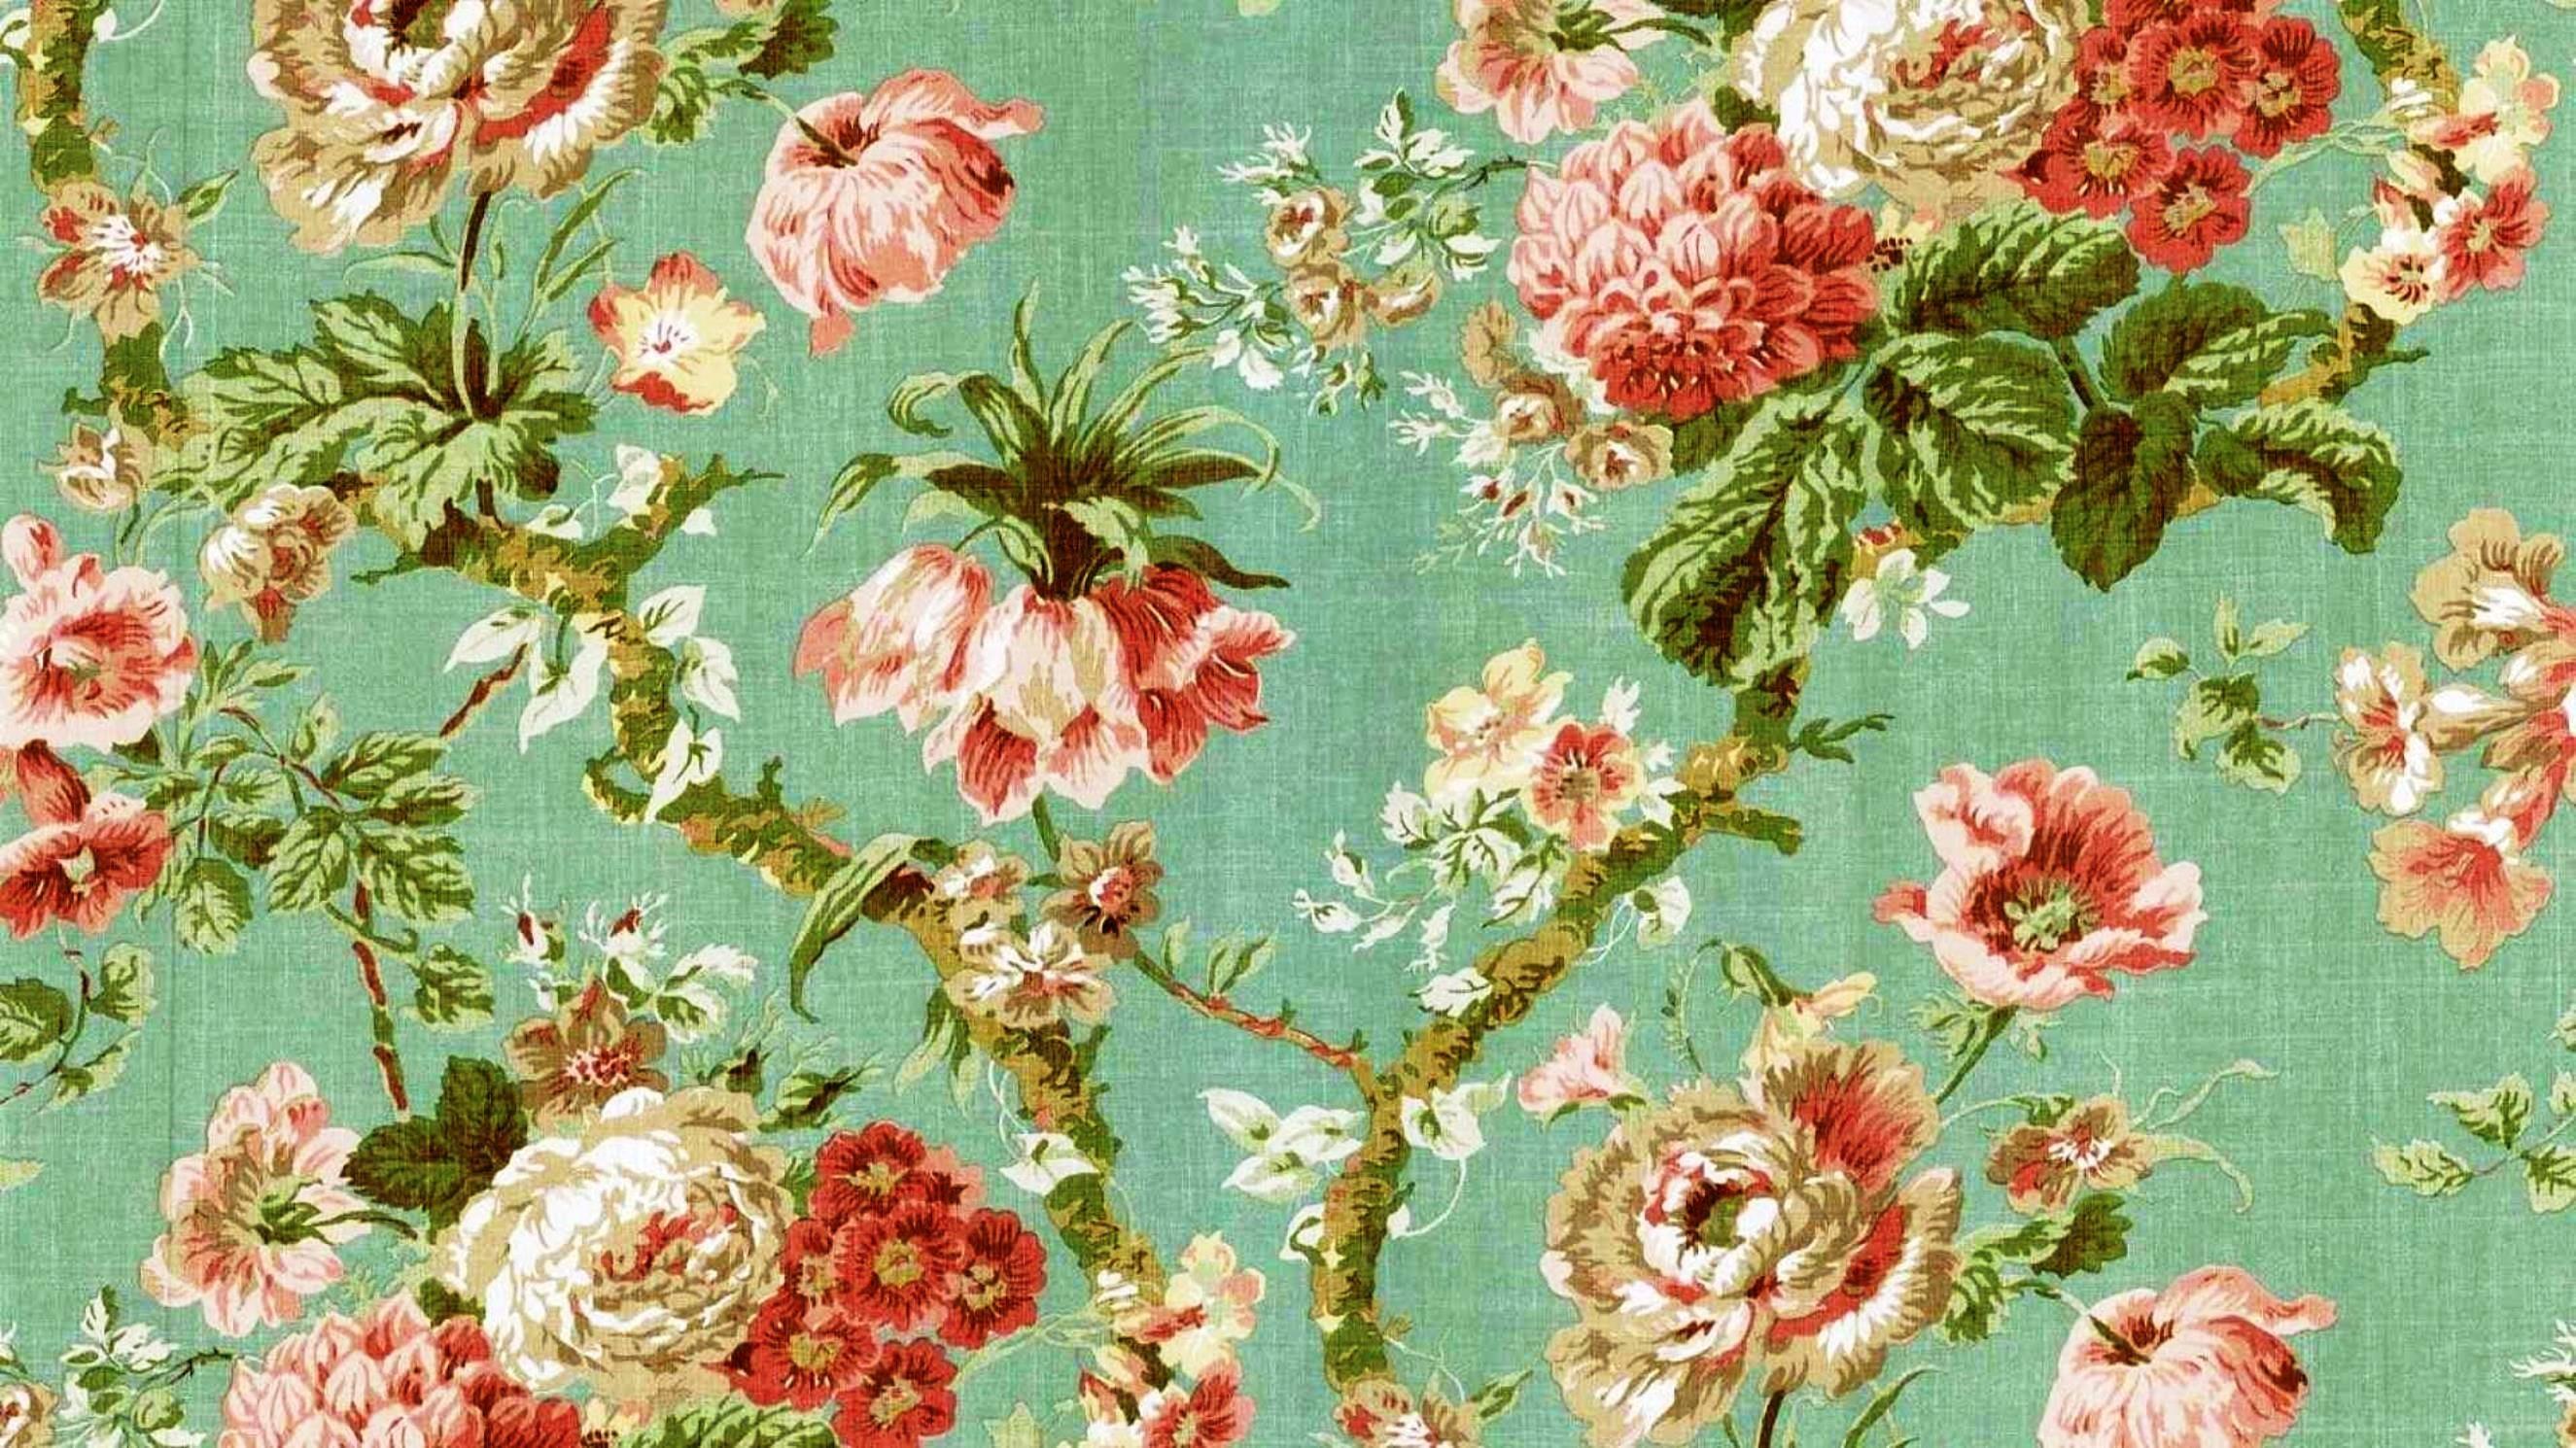 Vintage Floral Wallpaper Google Search Floral Wallpaper